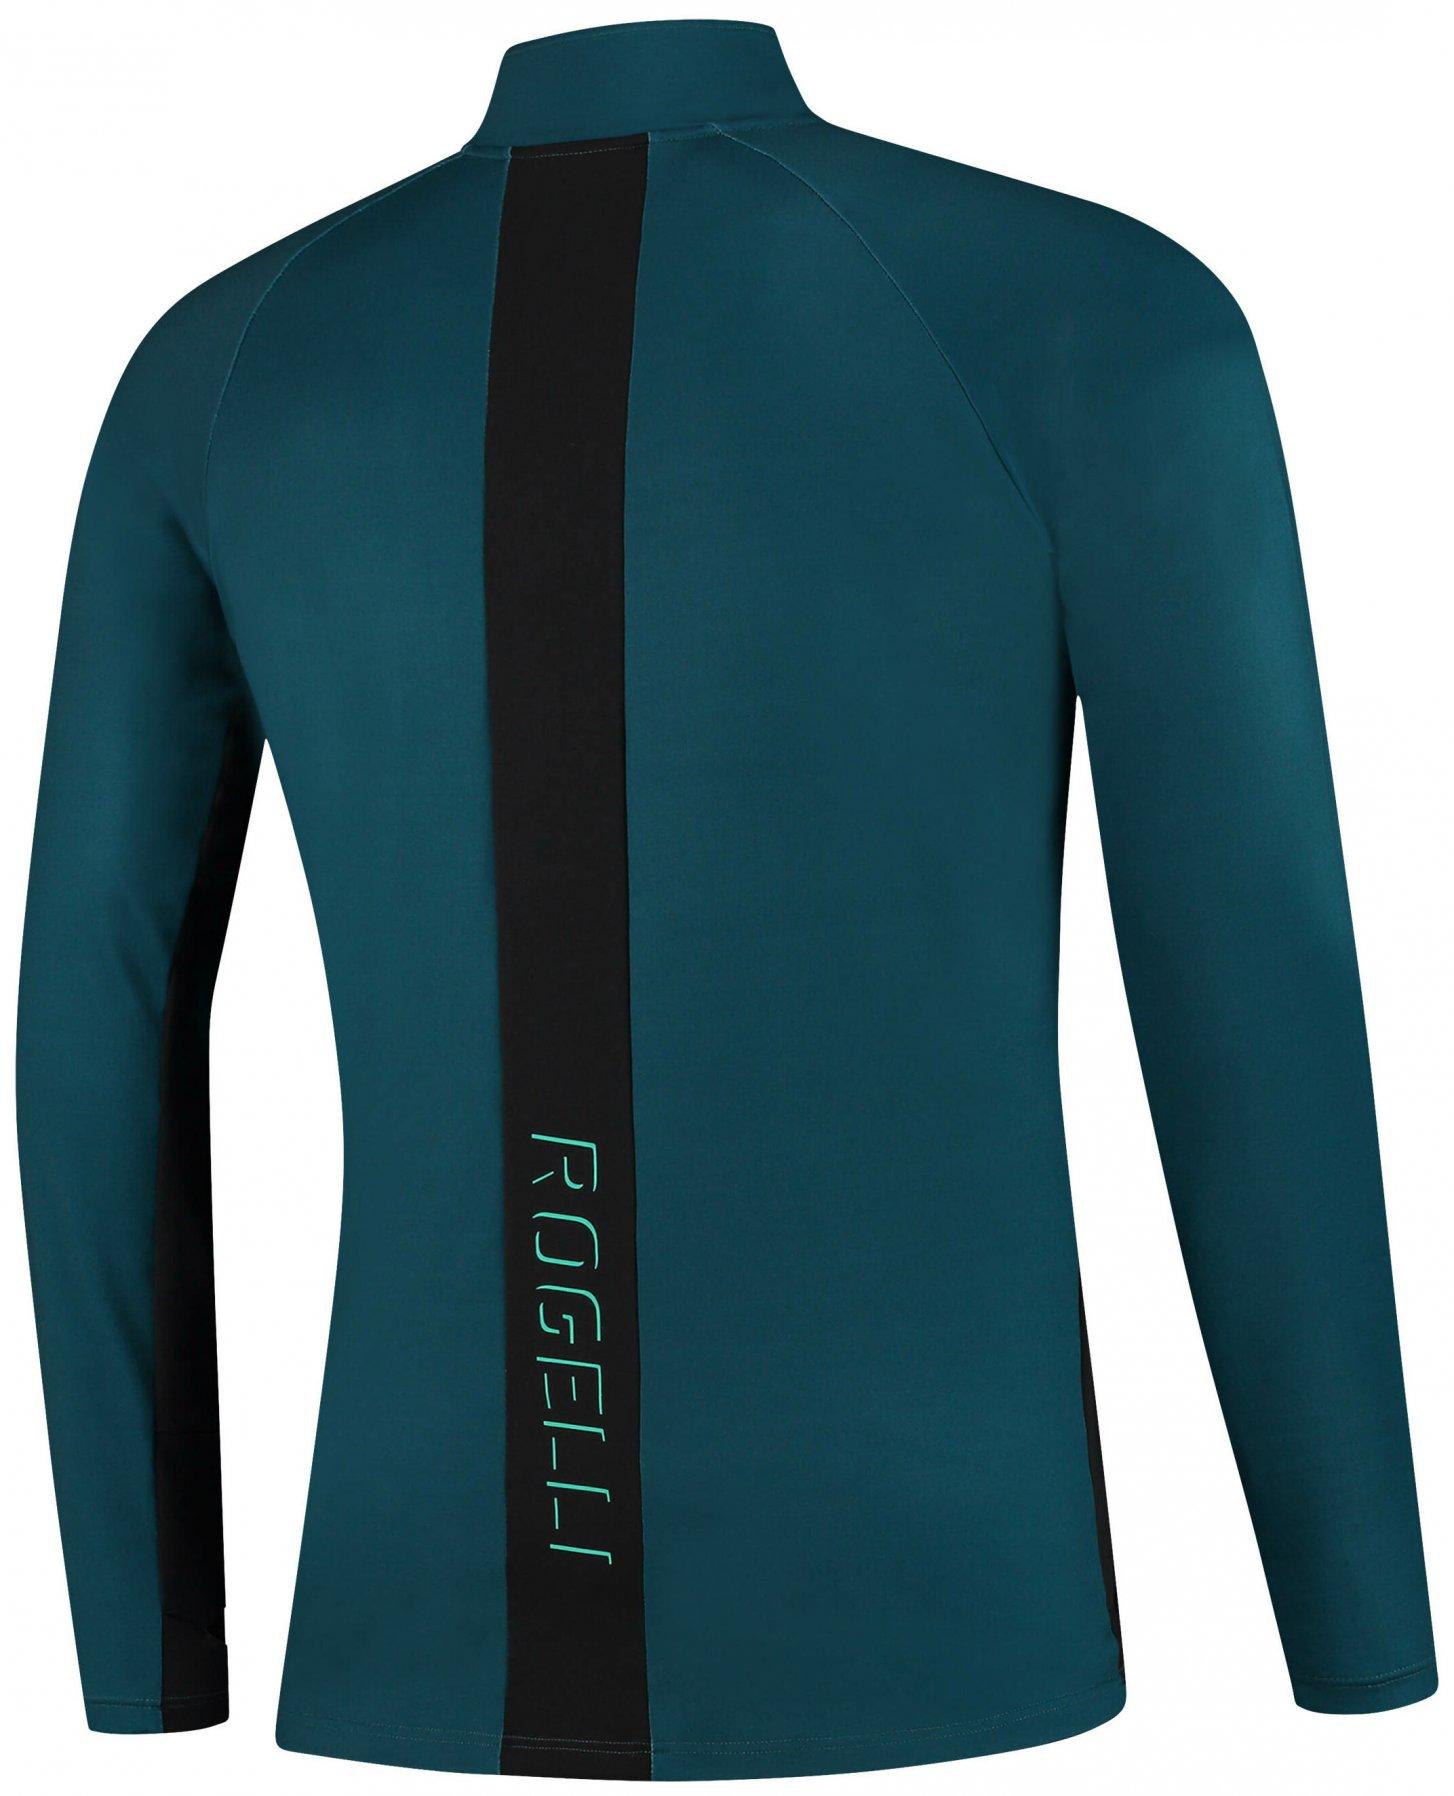 Rogelli steel męska ocieplana koszulka / bluza do biegania, turkusowa - Rozmiar: 2XL